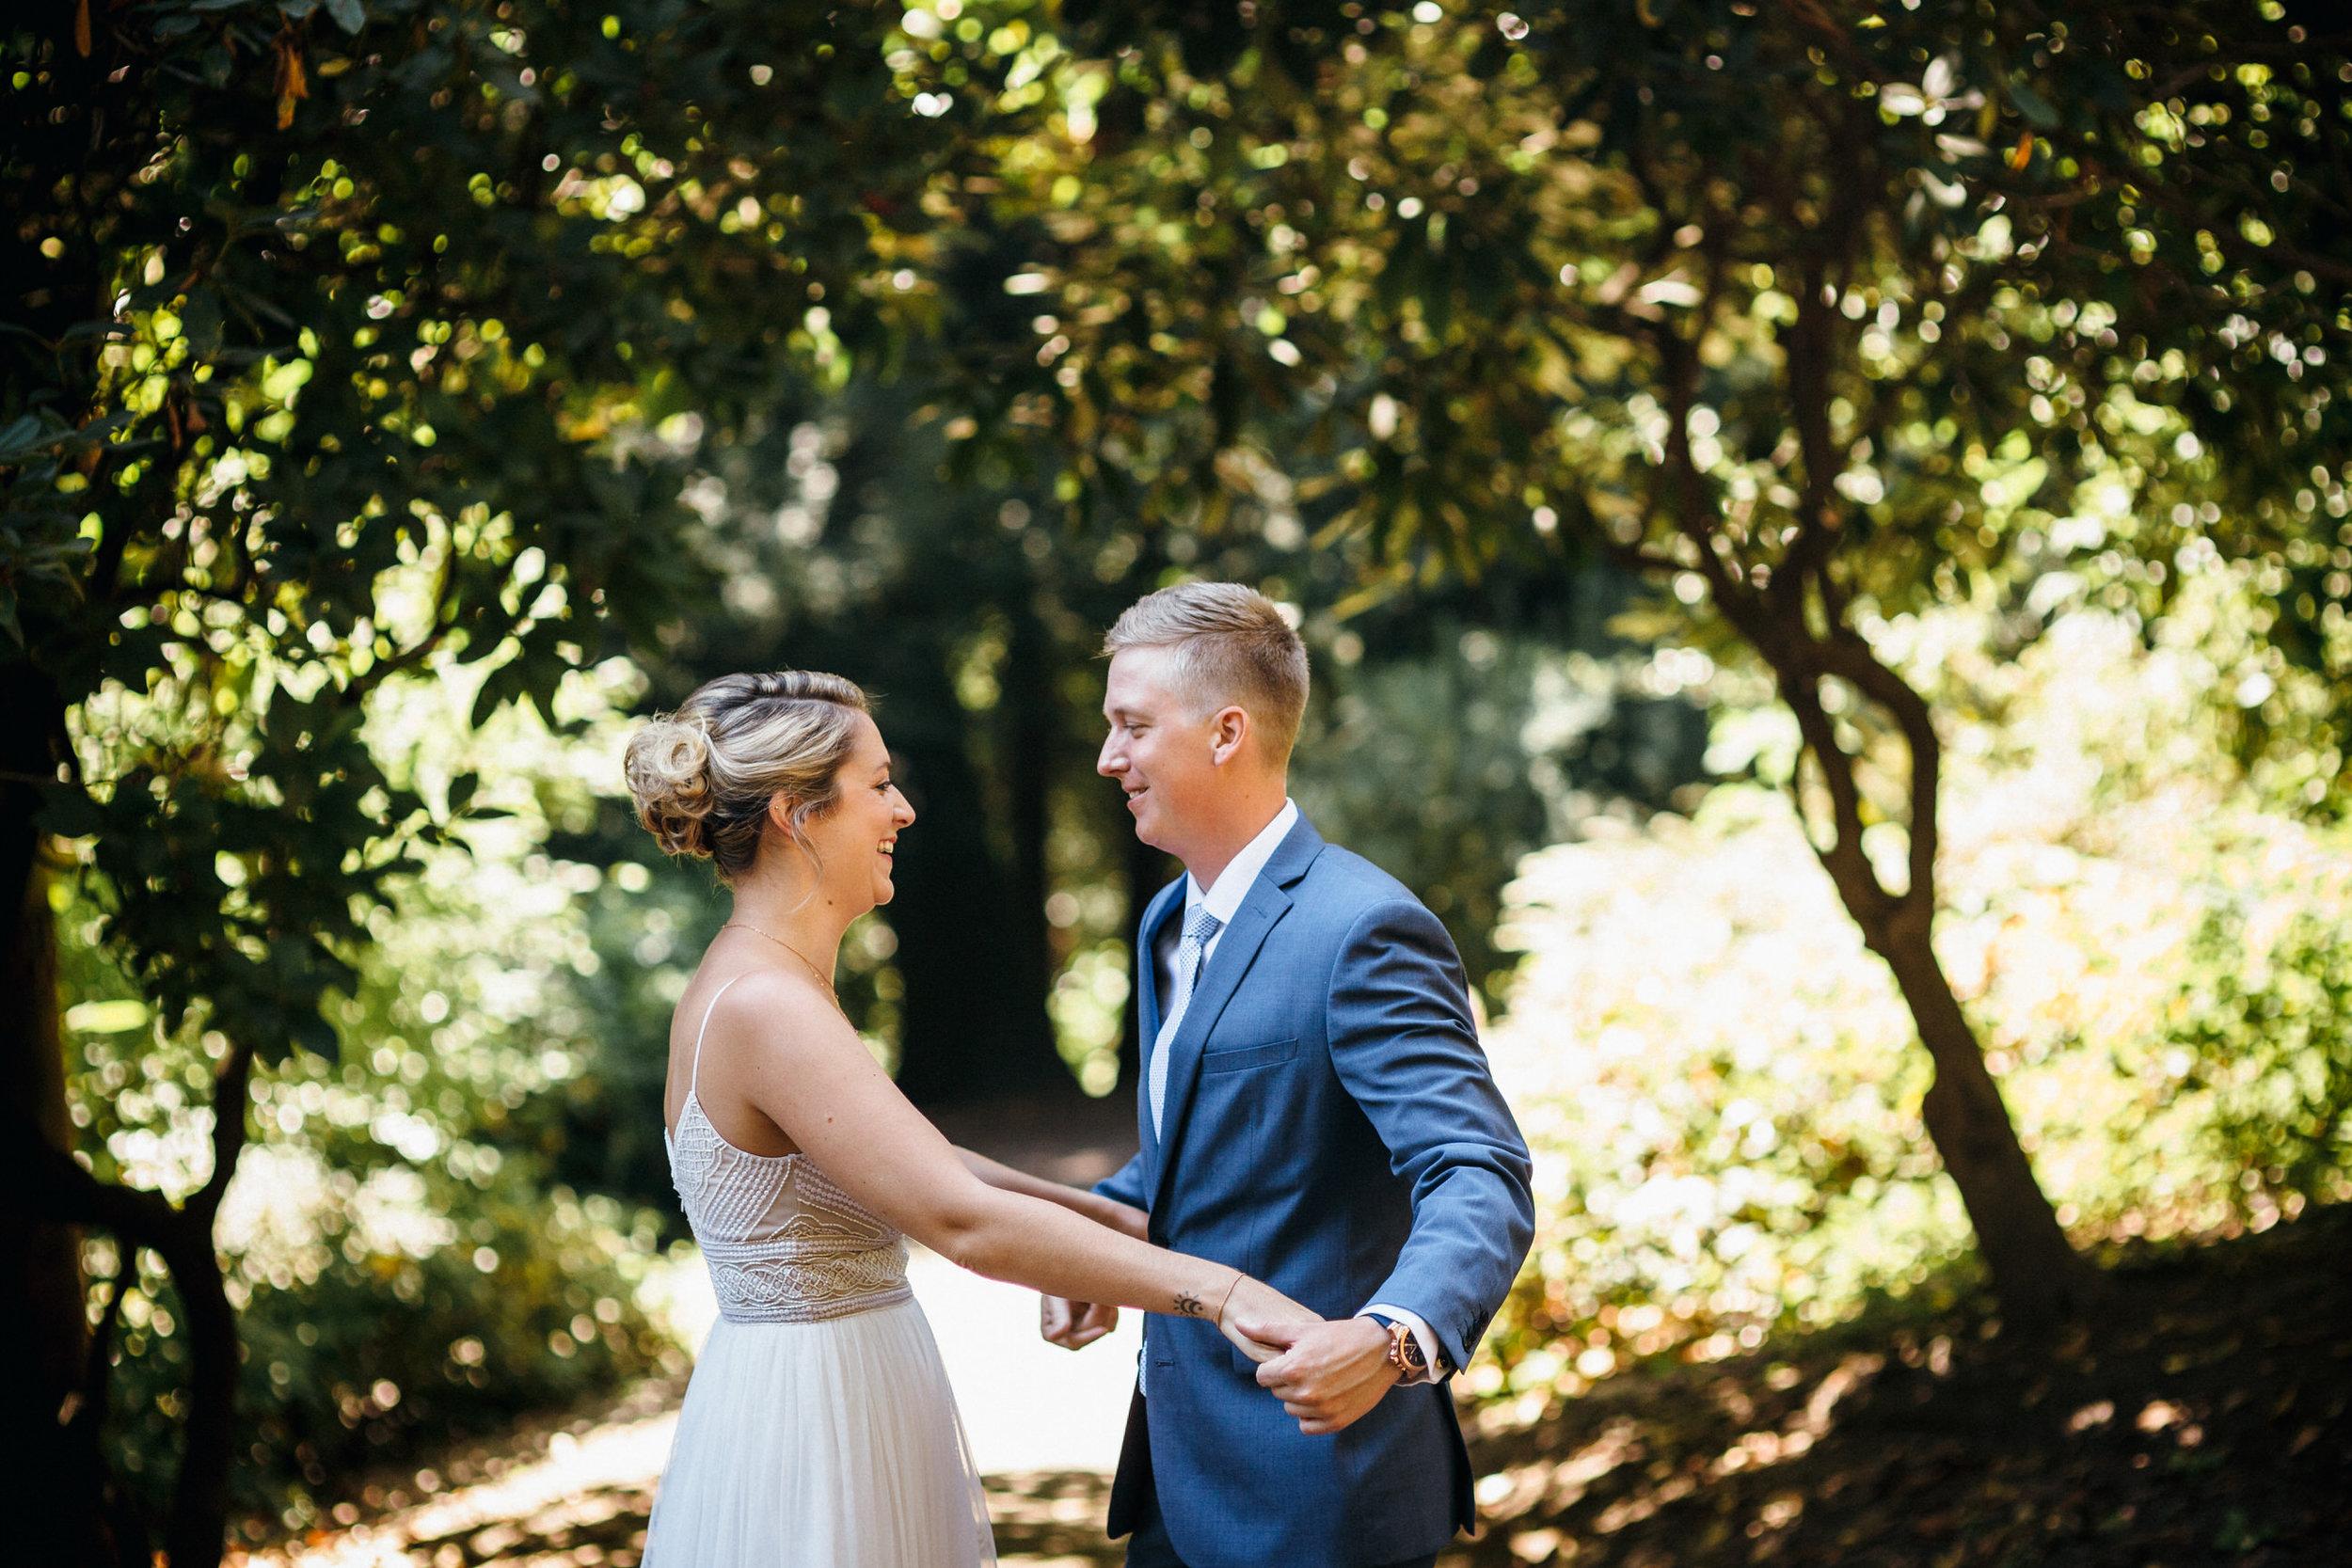 Laurelhurst Park club wedding photographer Portand pdx Oregon028.JPG